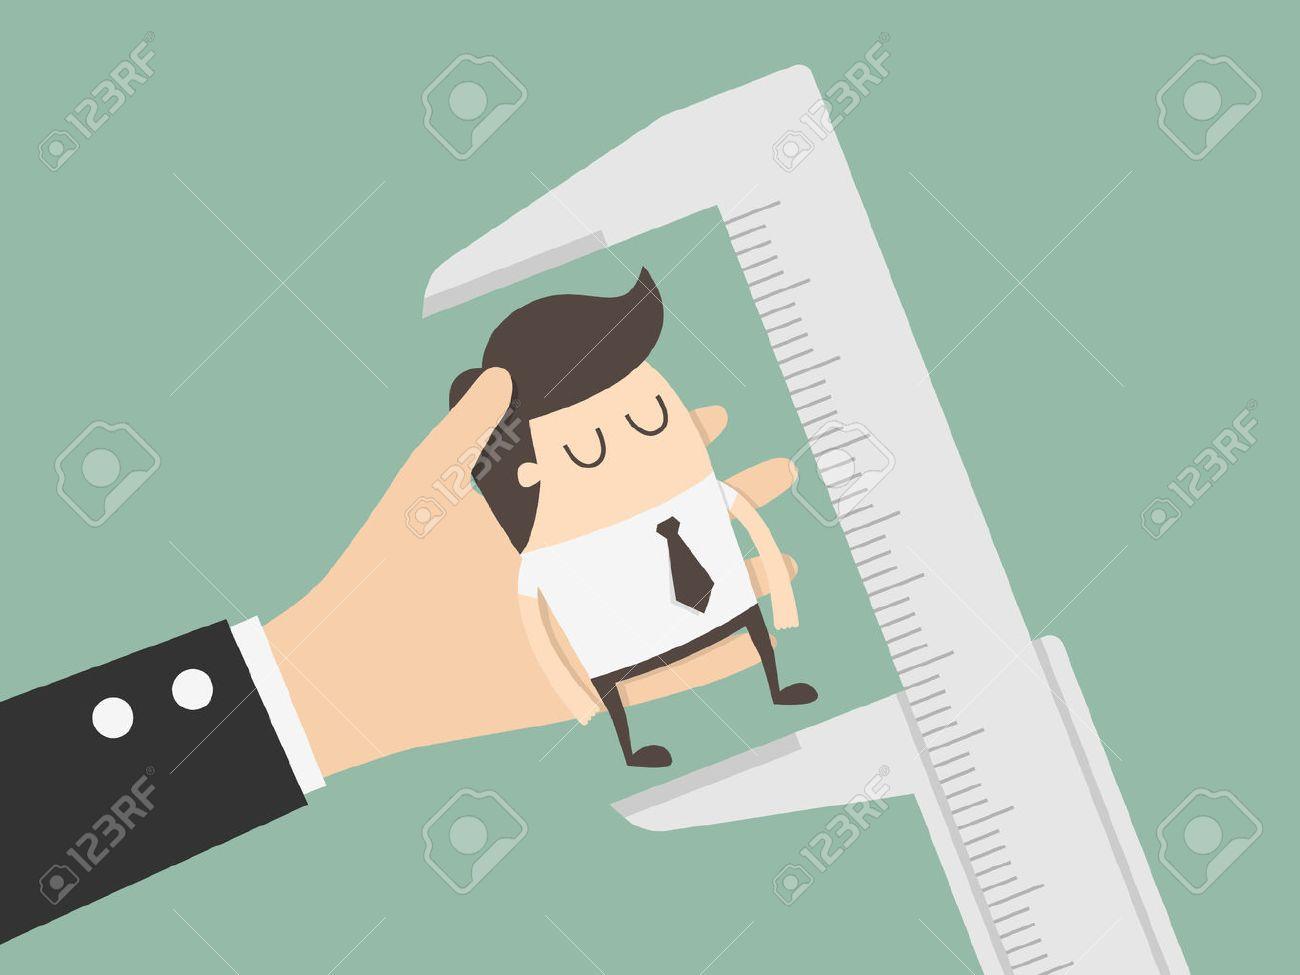 Employee Evaluation. Business Concept Cartoon Illustration. - 55498164